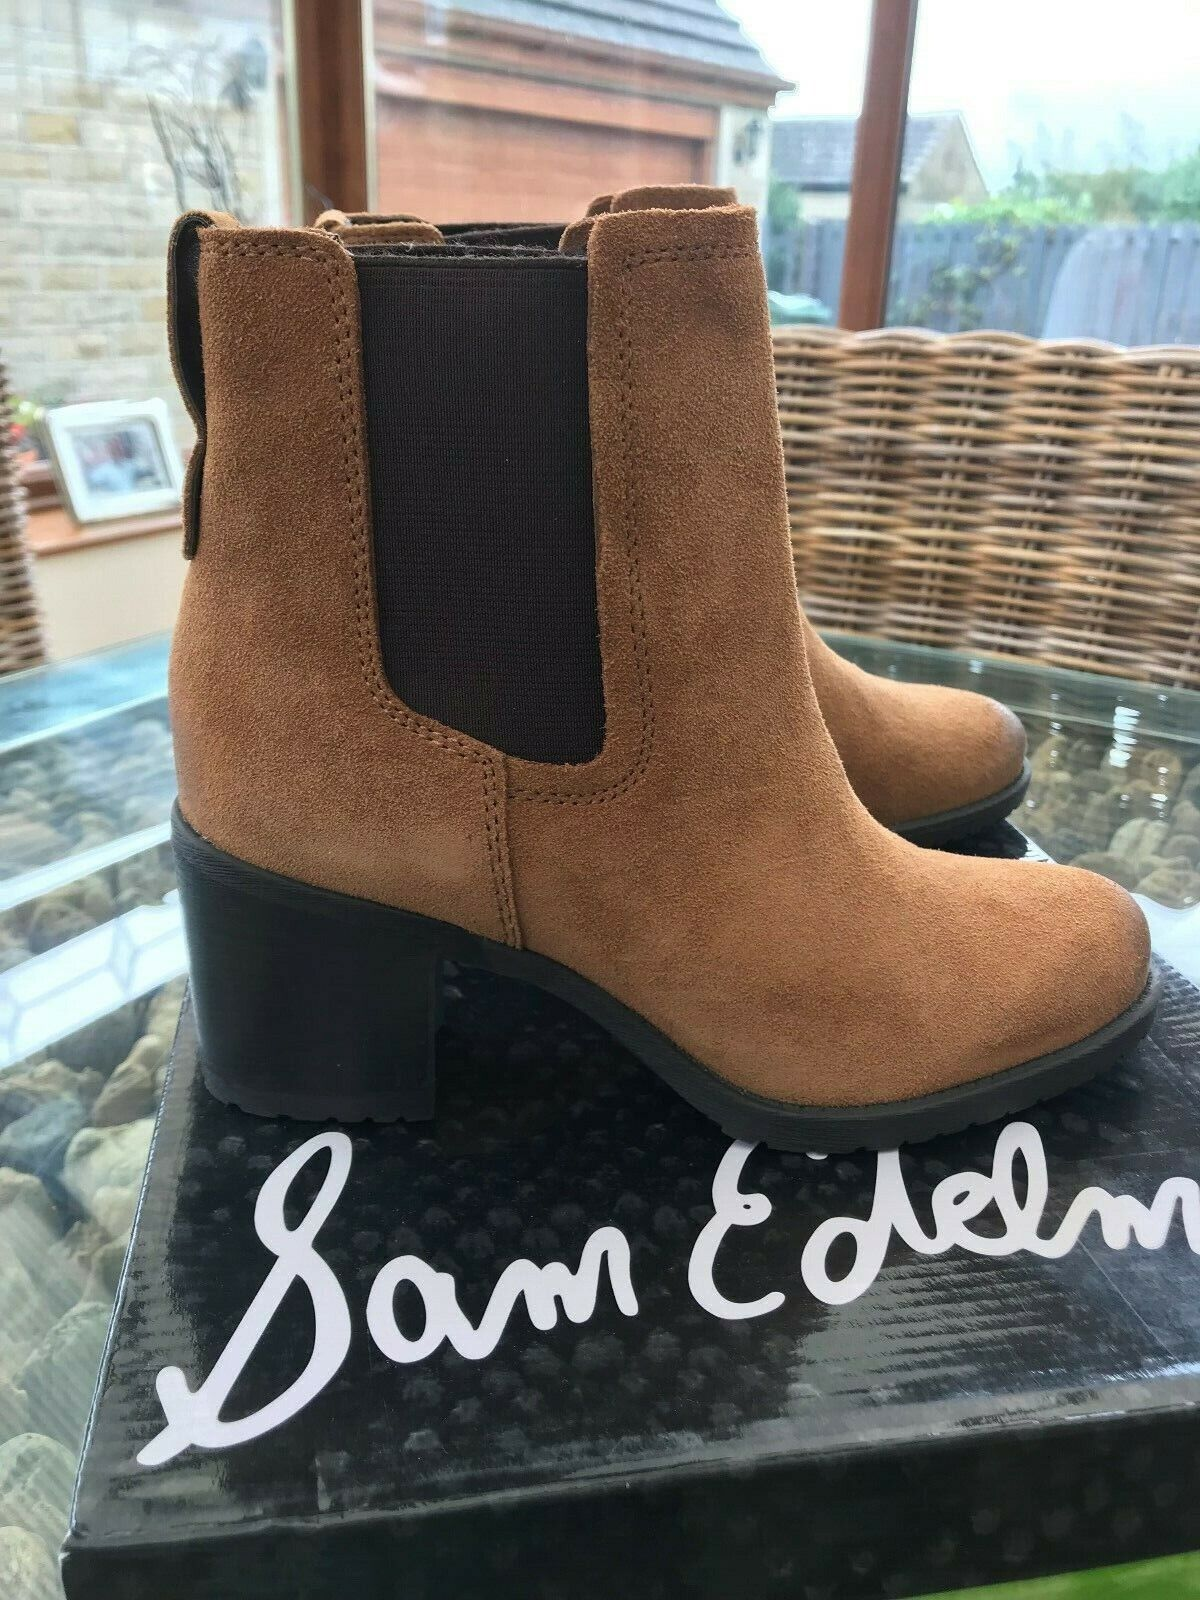 Sam Edelman Designer Tan Suede Distressed Look Block Heel Ankle Stiefel New